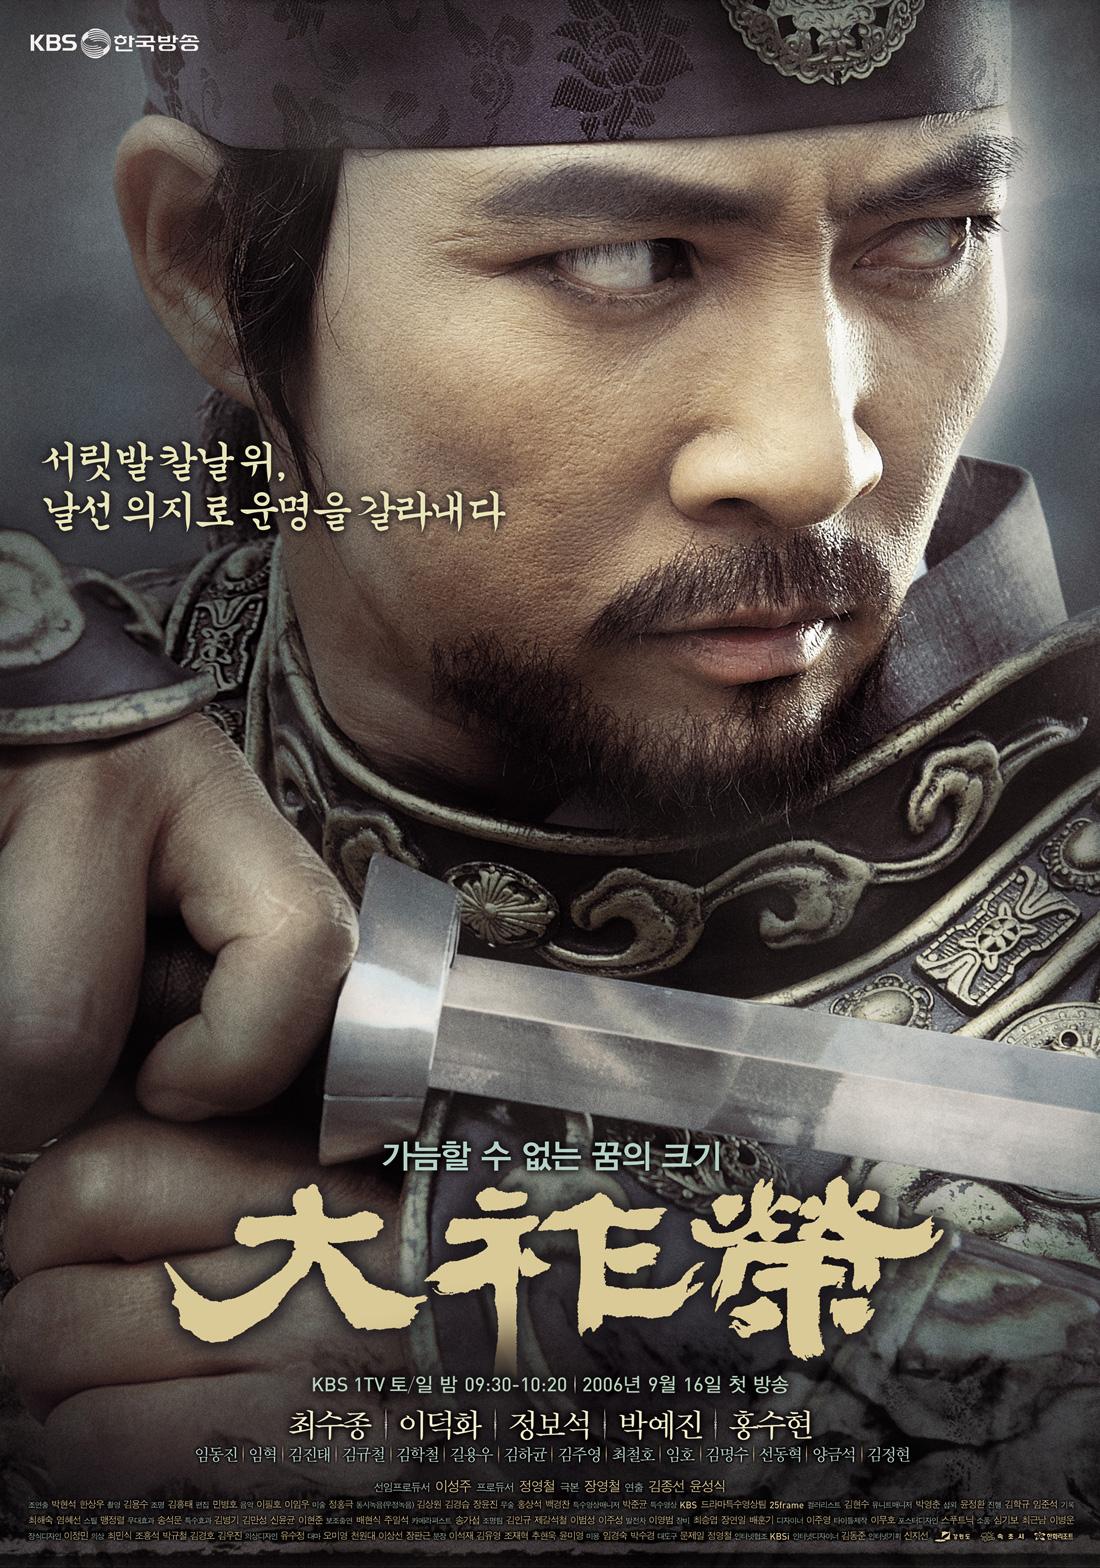 The_King_Dae_Joyoung02.jpg